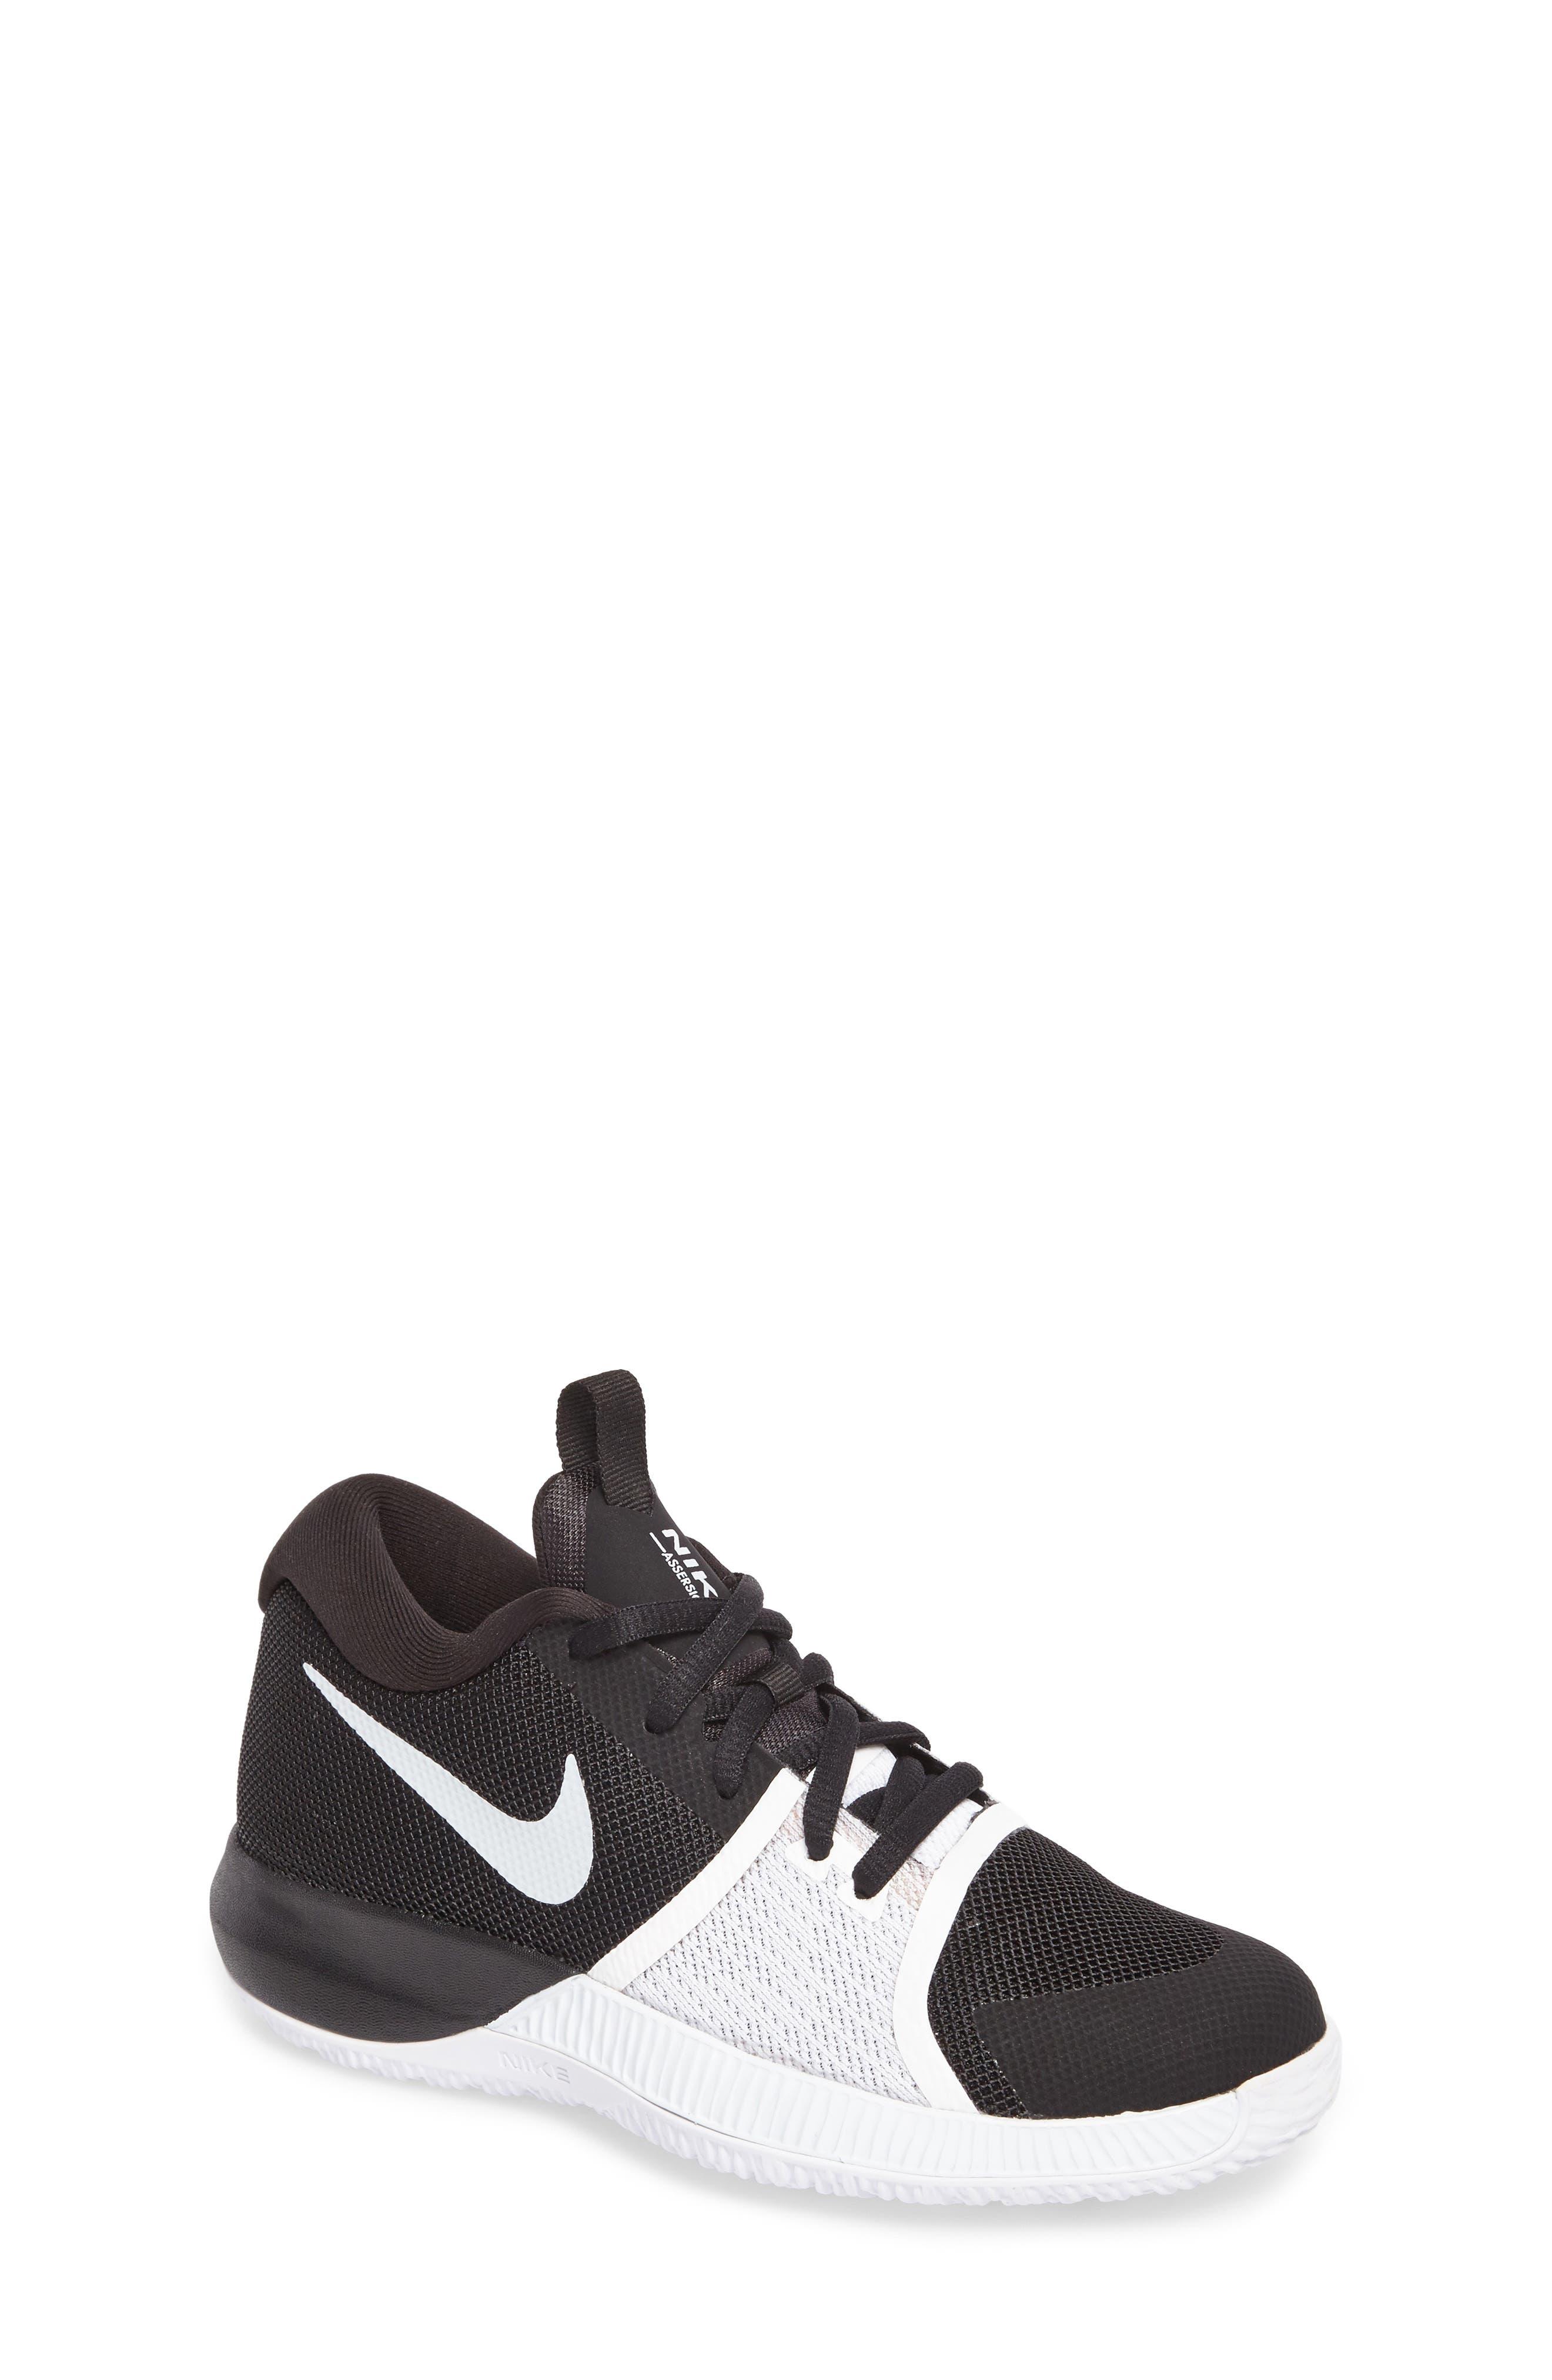 Assersion Sneaker,                         Main,                         color, 005